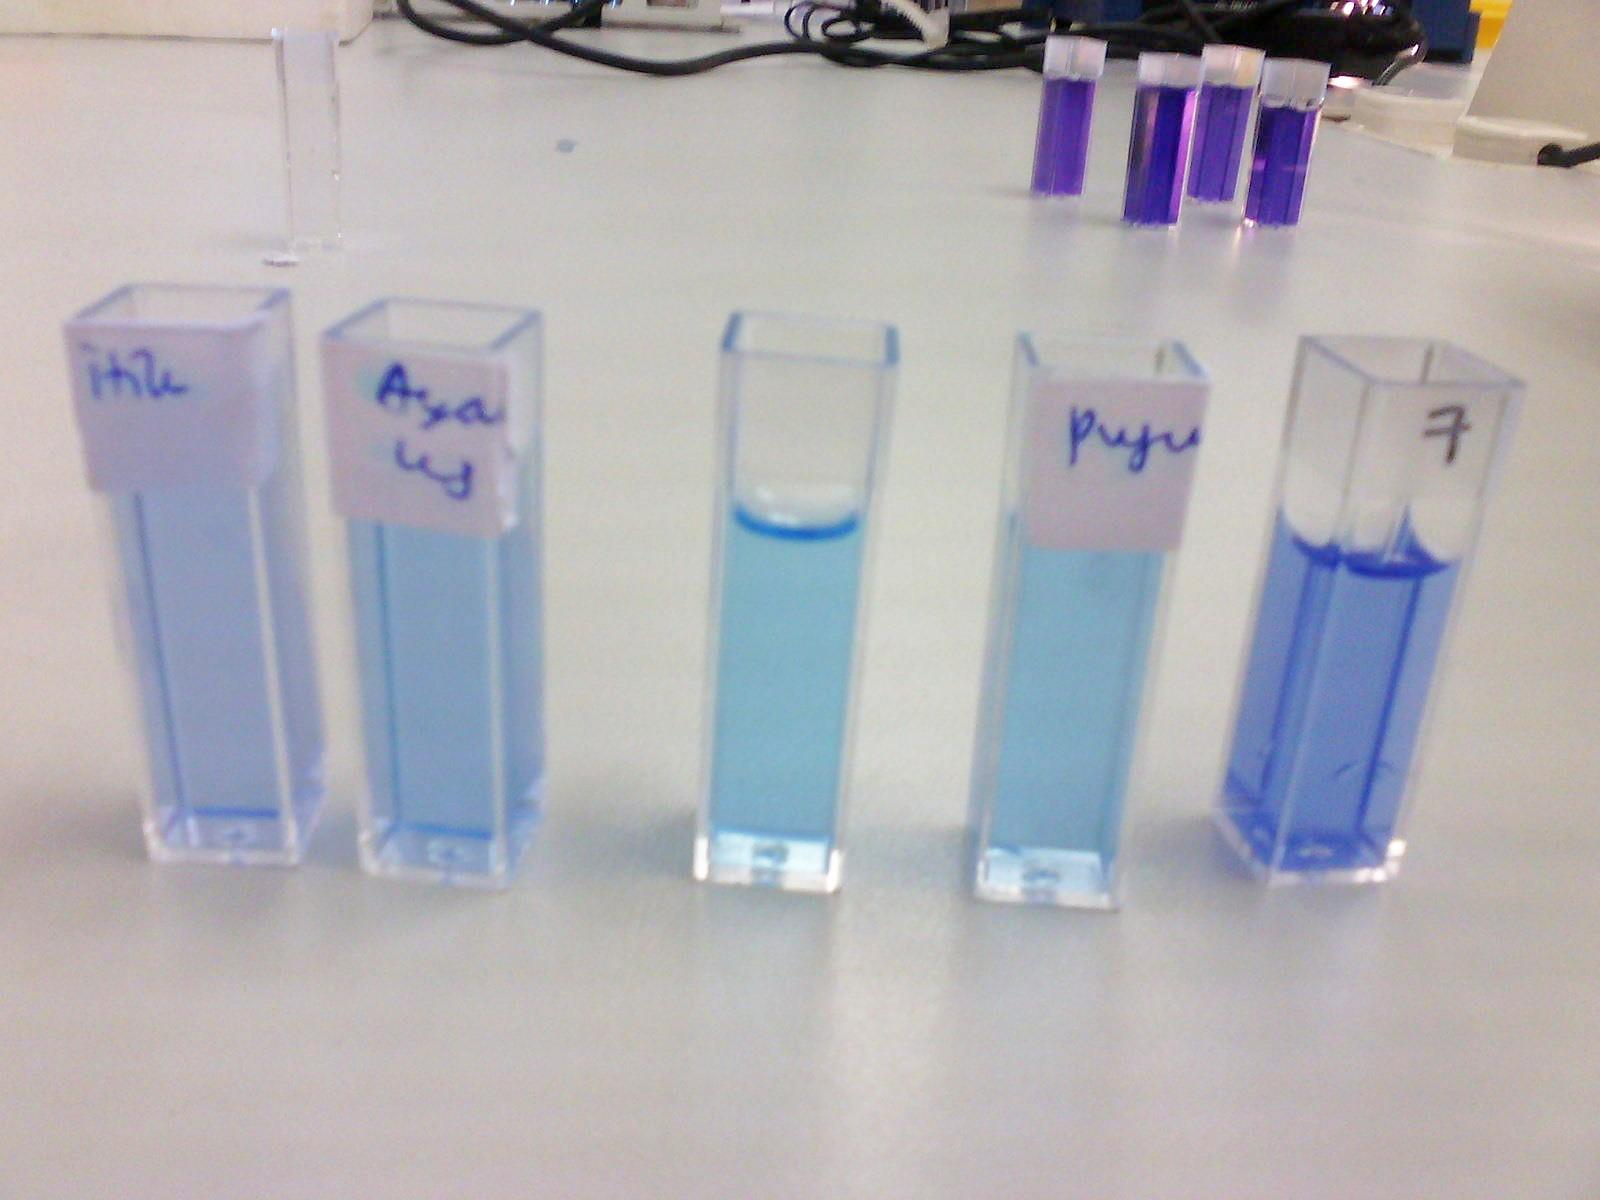 Biochem The Odd Crazy But Fun April